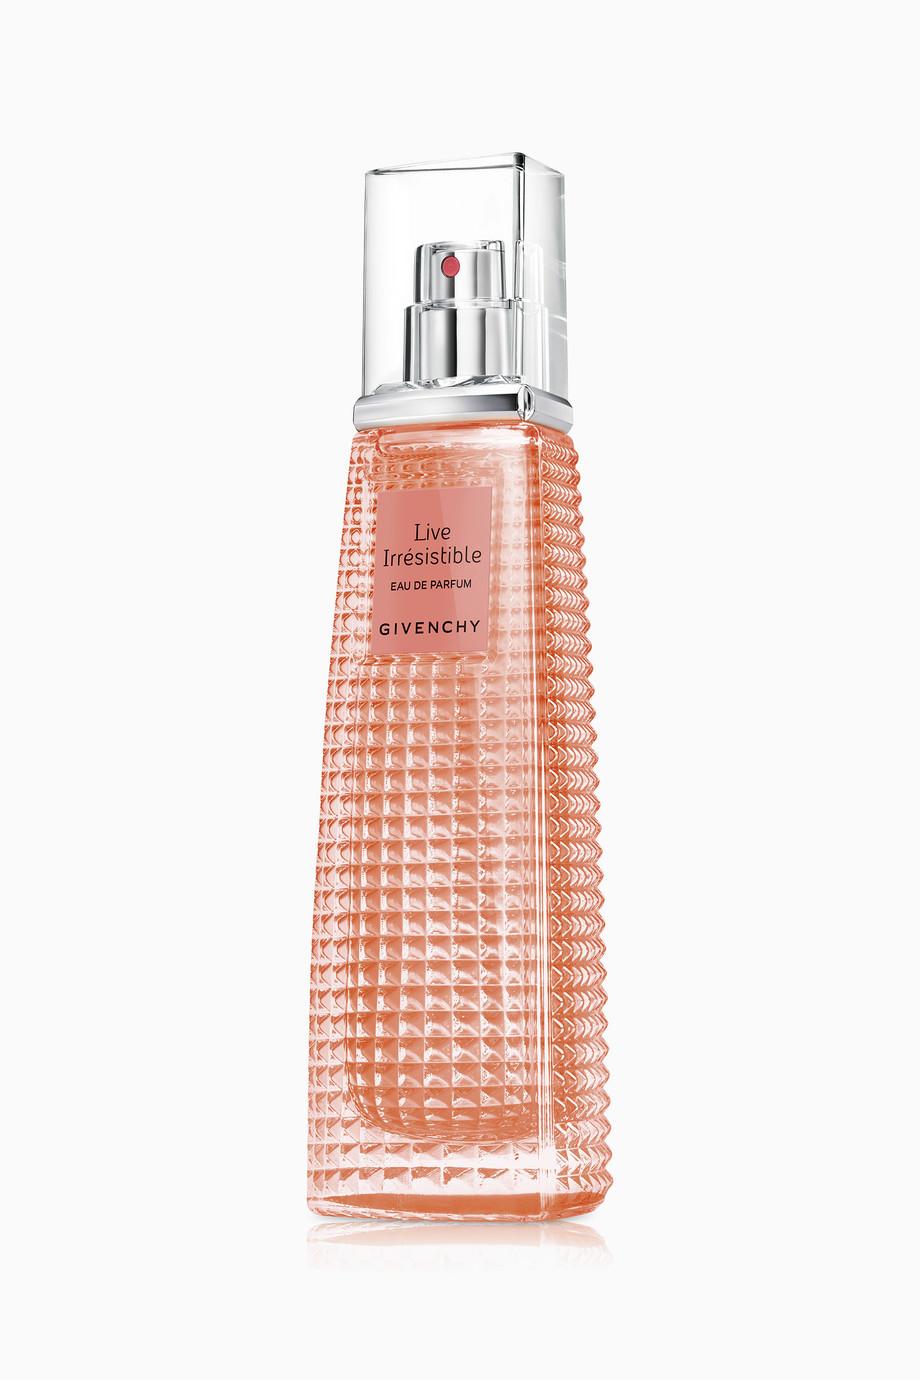 4f2b0fa0c5 Very Irrésistible Eau de Parfum, 50ml. OUT OF STOCK. Givenchy Beauty